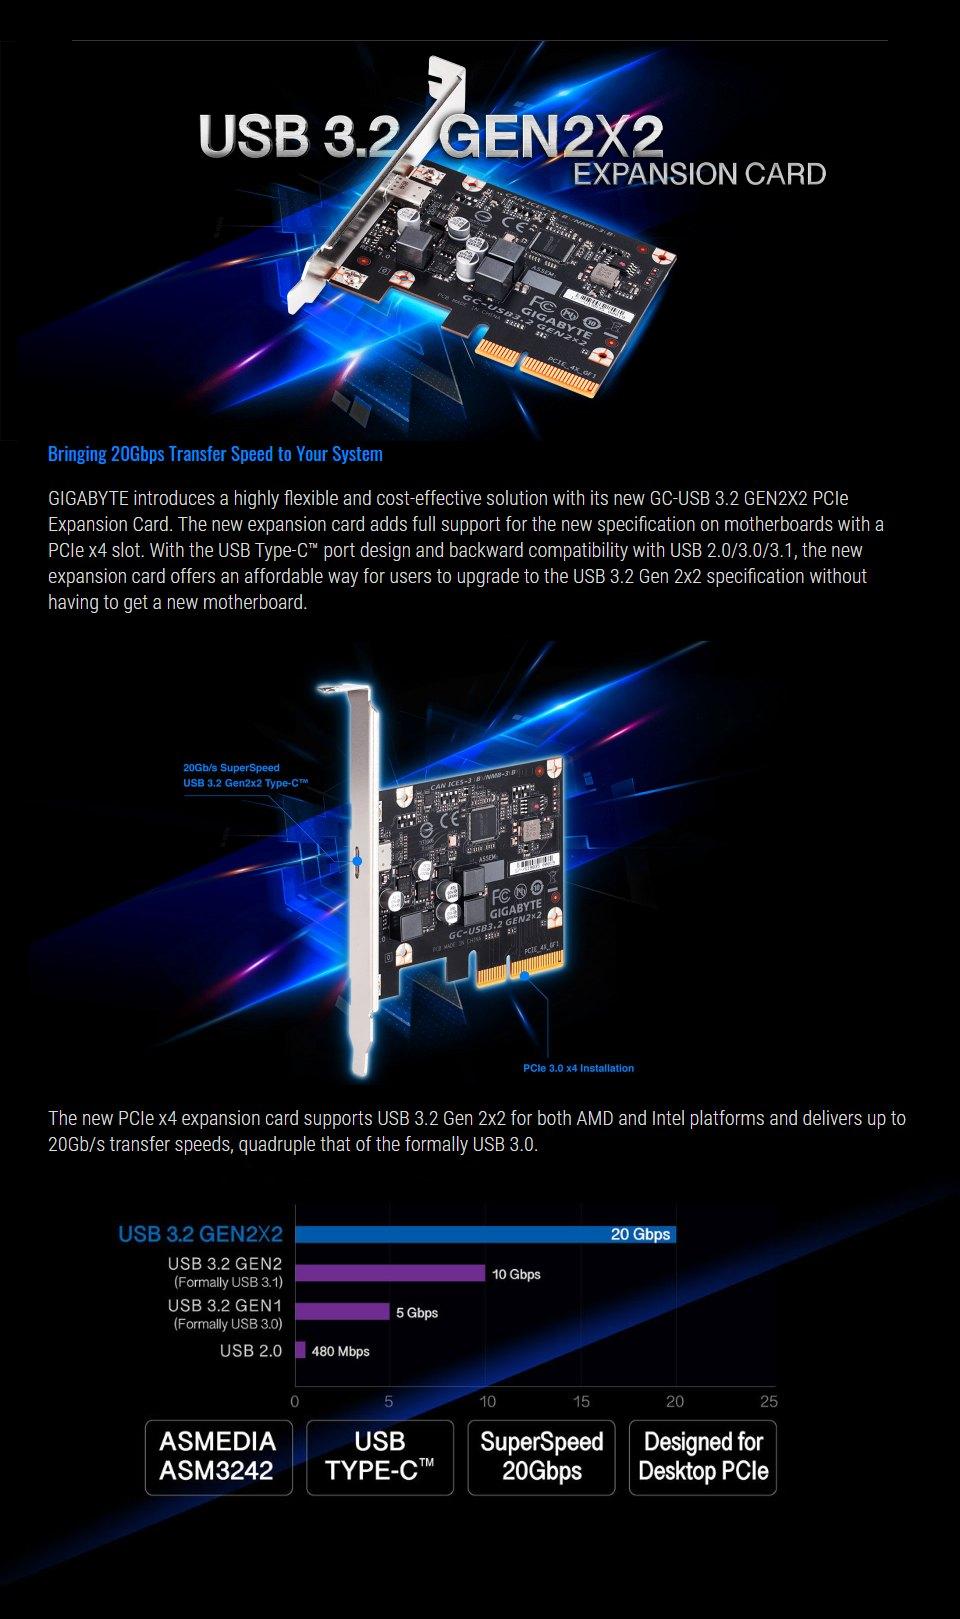 Gigabyte PCIe USB 3.2 Gen 2X2 Adaptor Card features